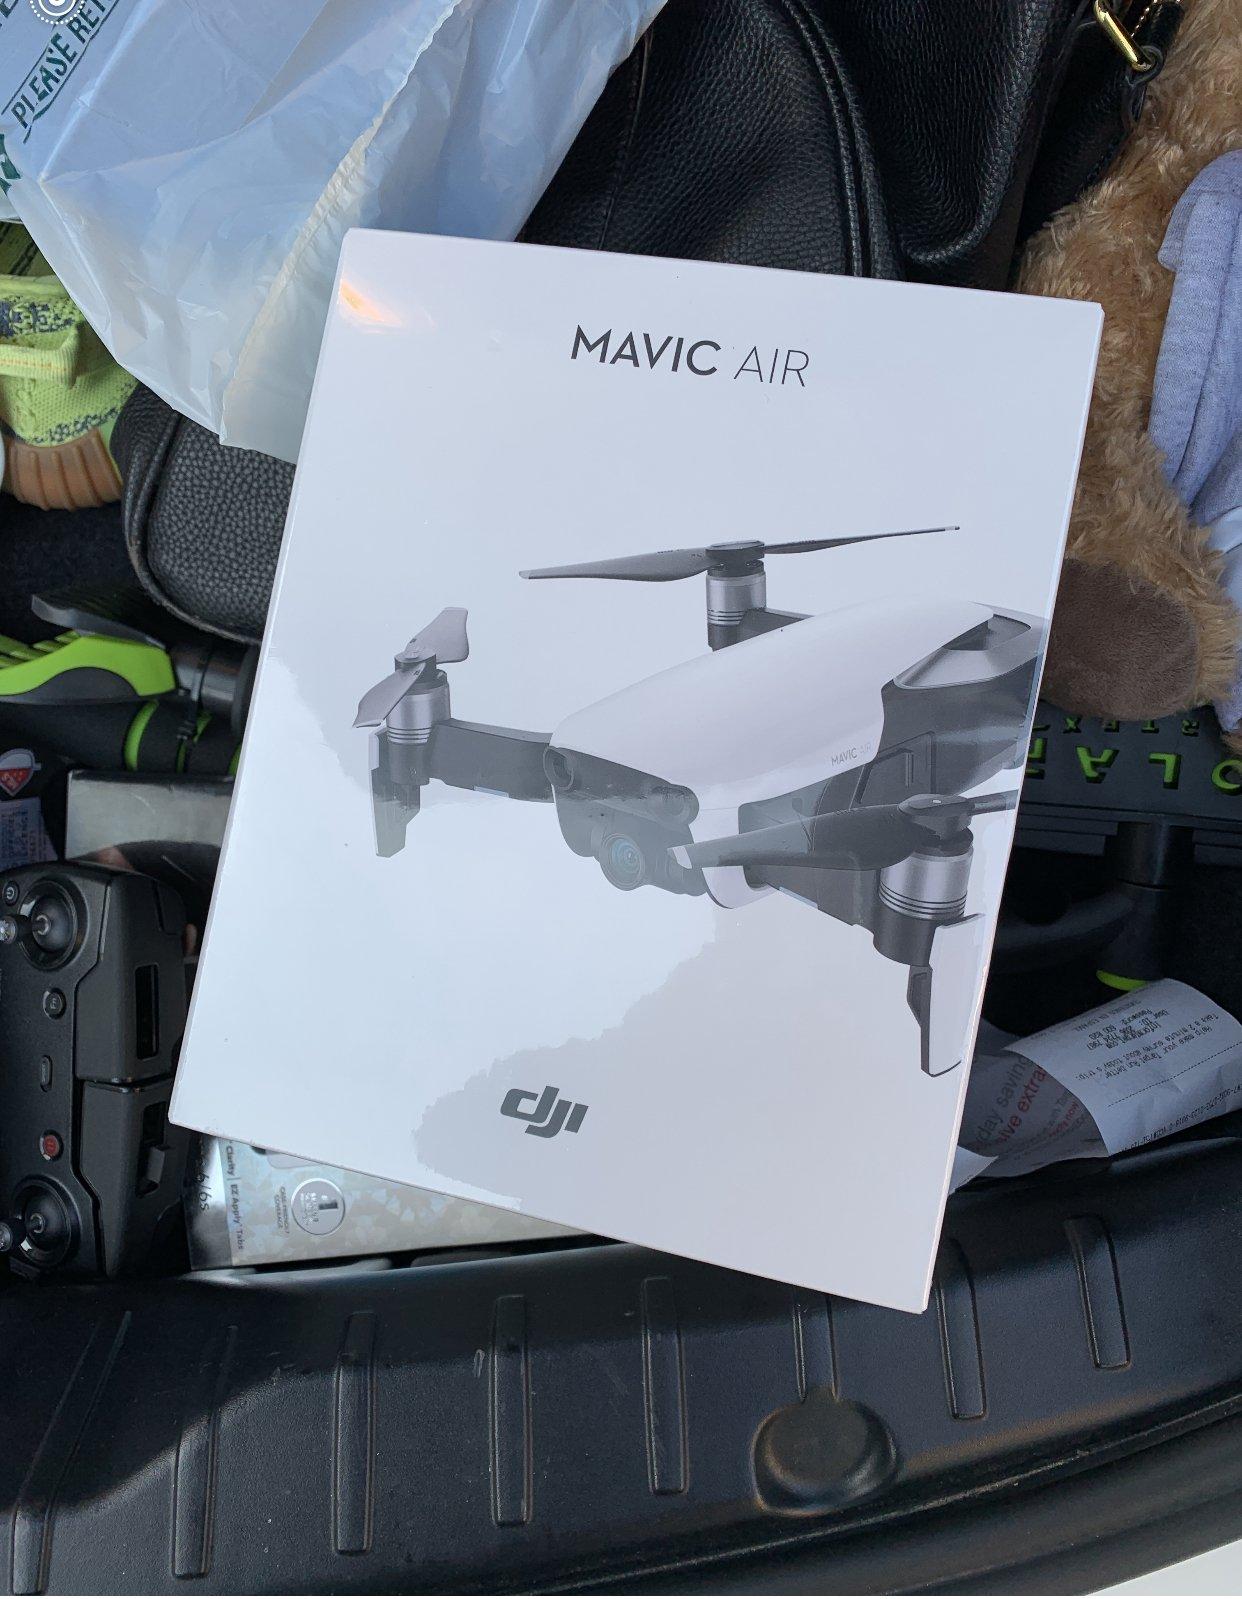 Mavic air brand new in box Image #1